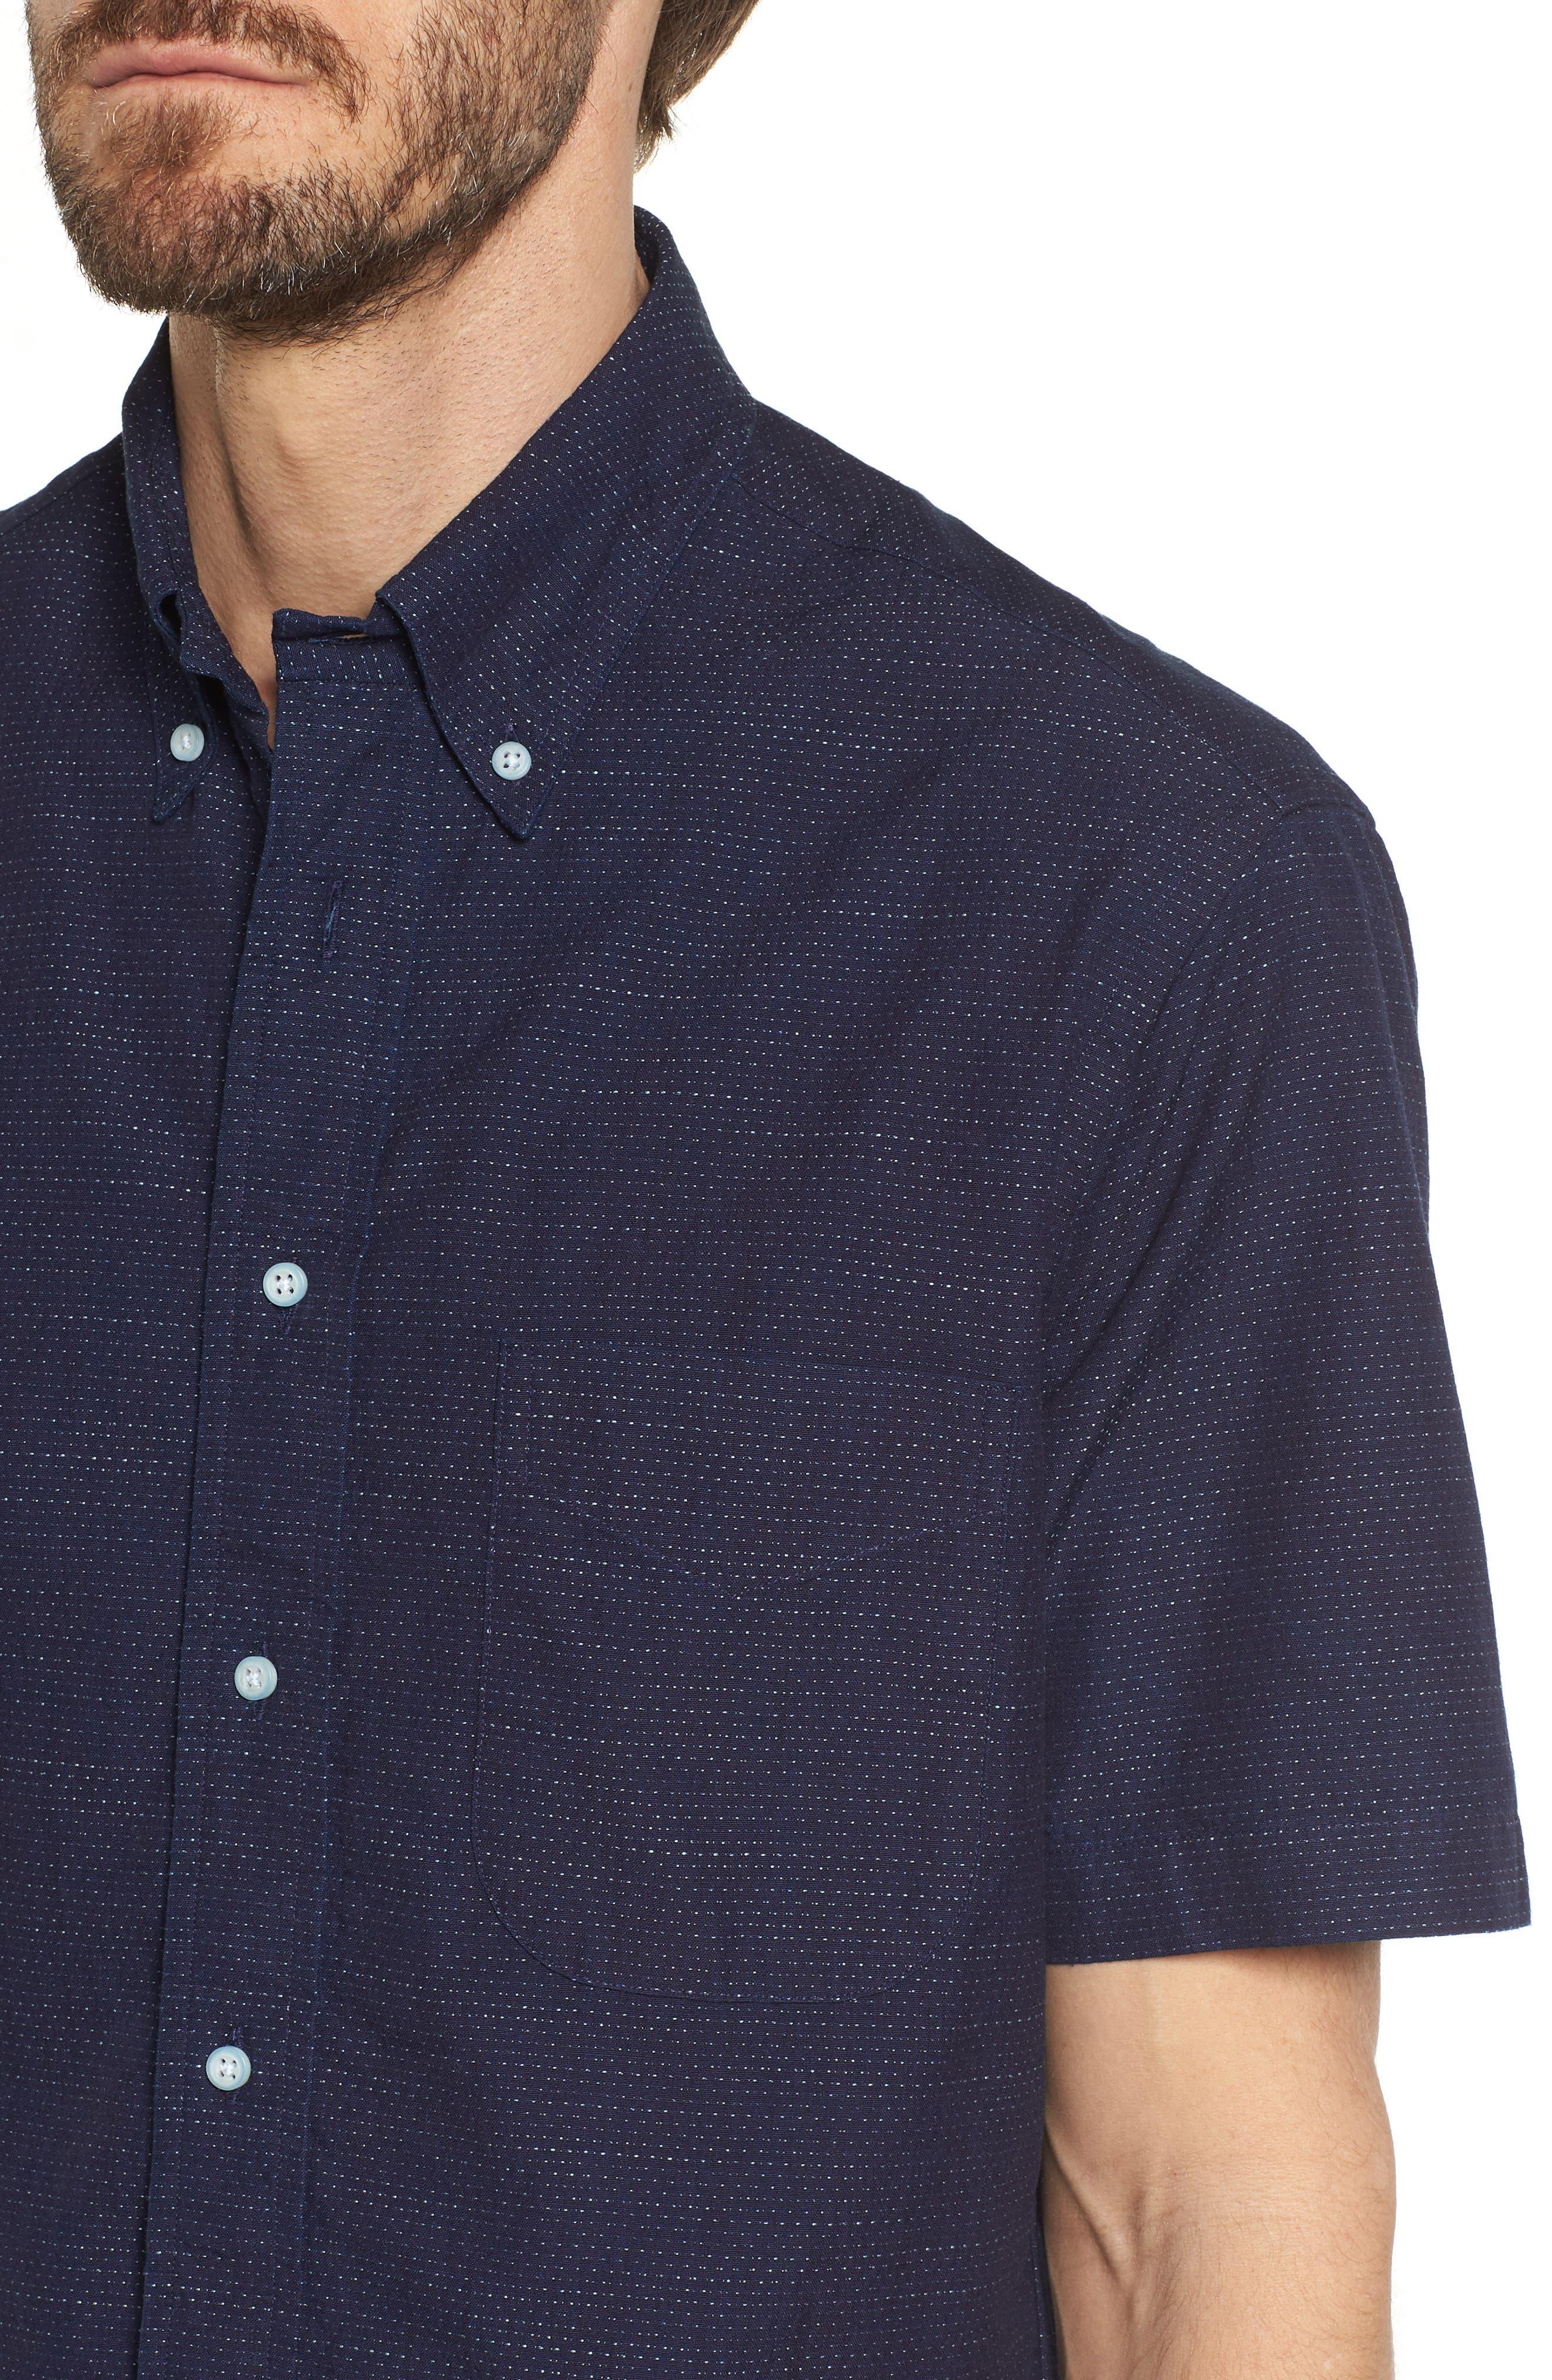 Camp Shirt,                             Alternate thumbnail 2, color,                             Navy